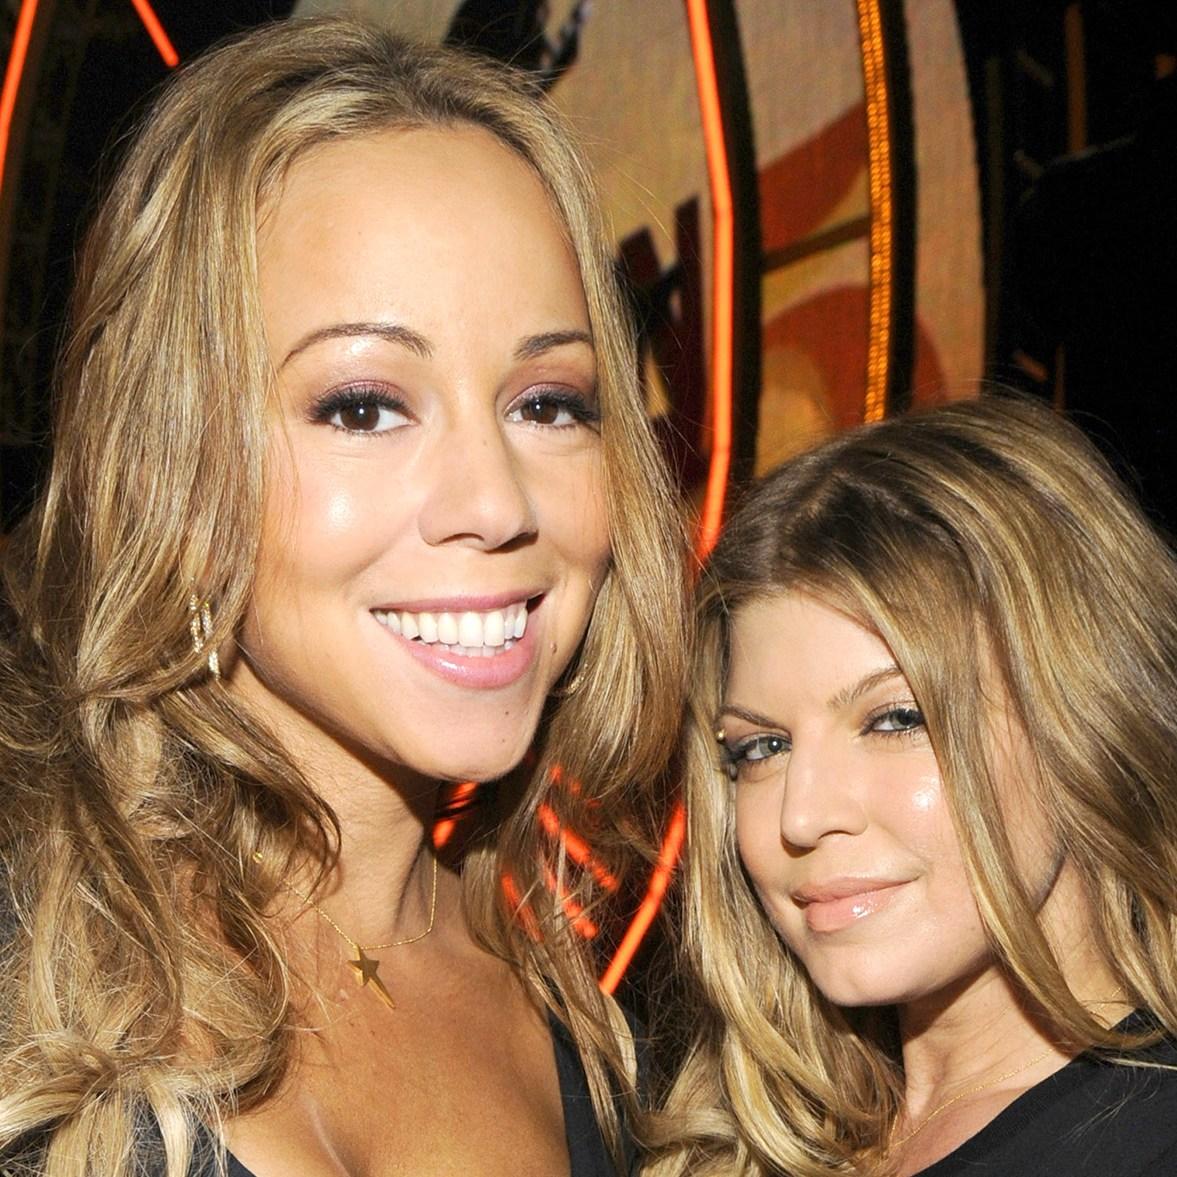 Mariah Carey and Fergie